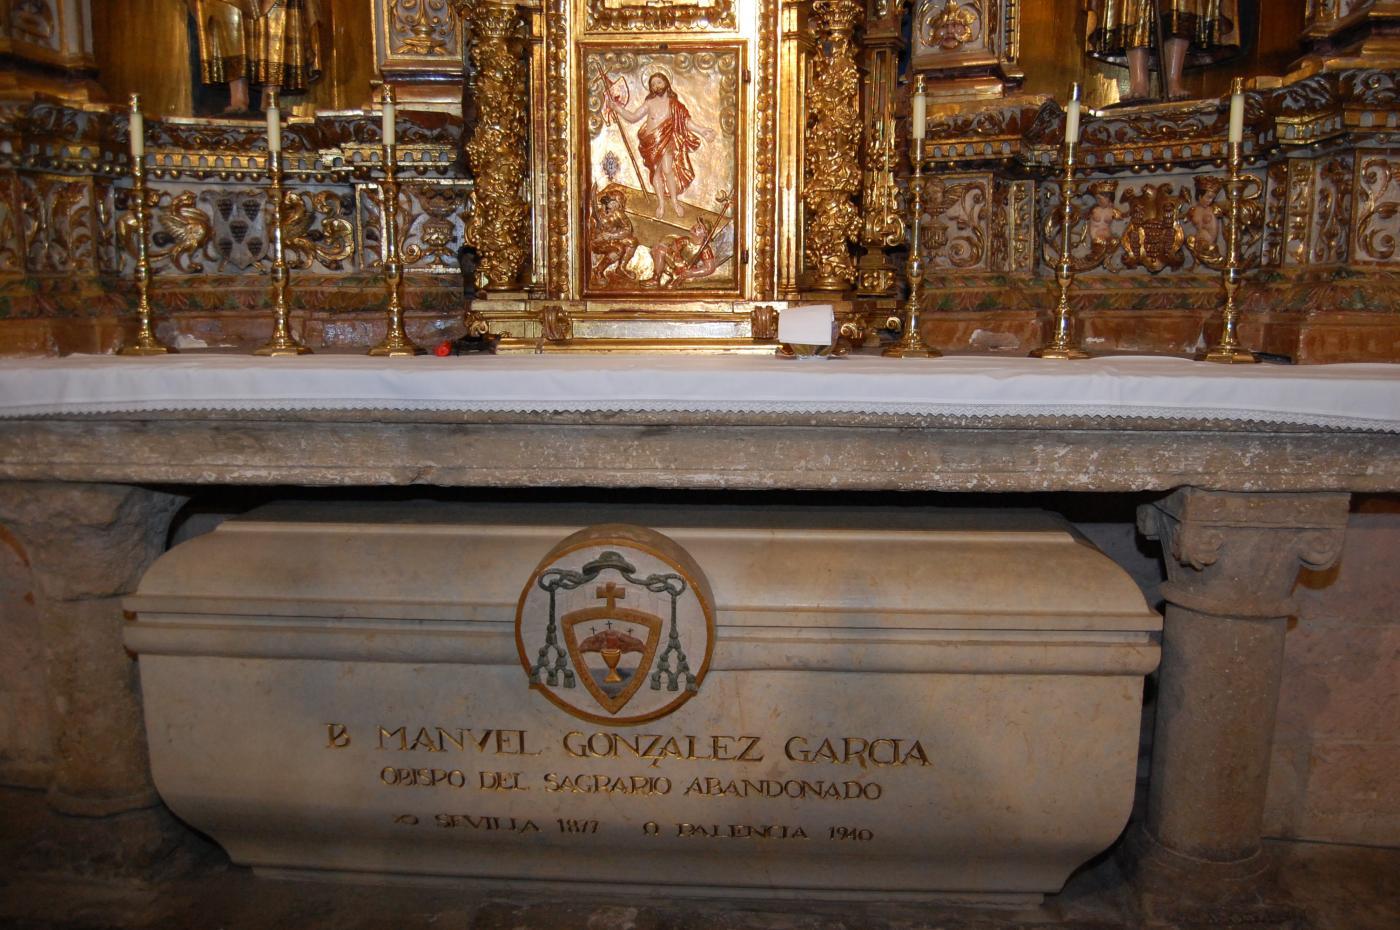 Tumba del próximo santo D. Manuel González, en la Catedral de Palencia